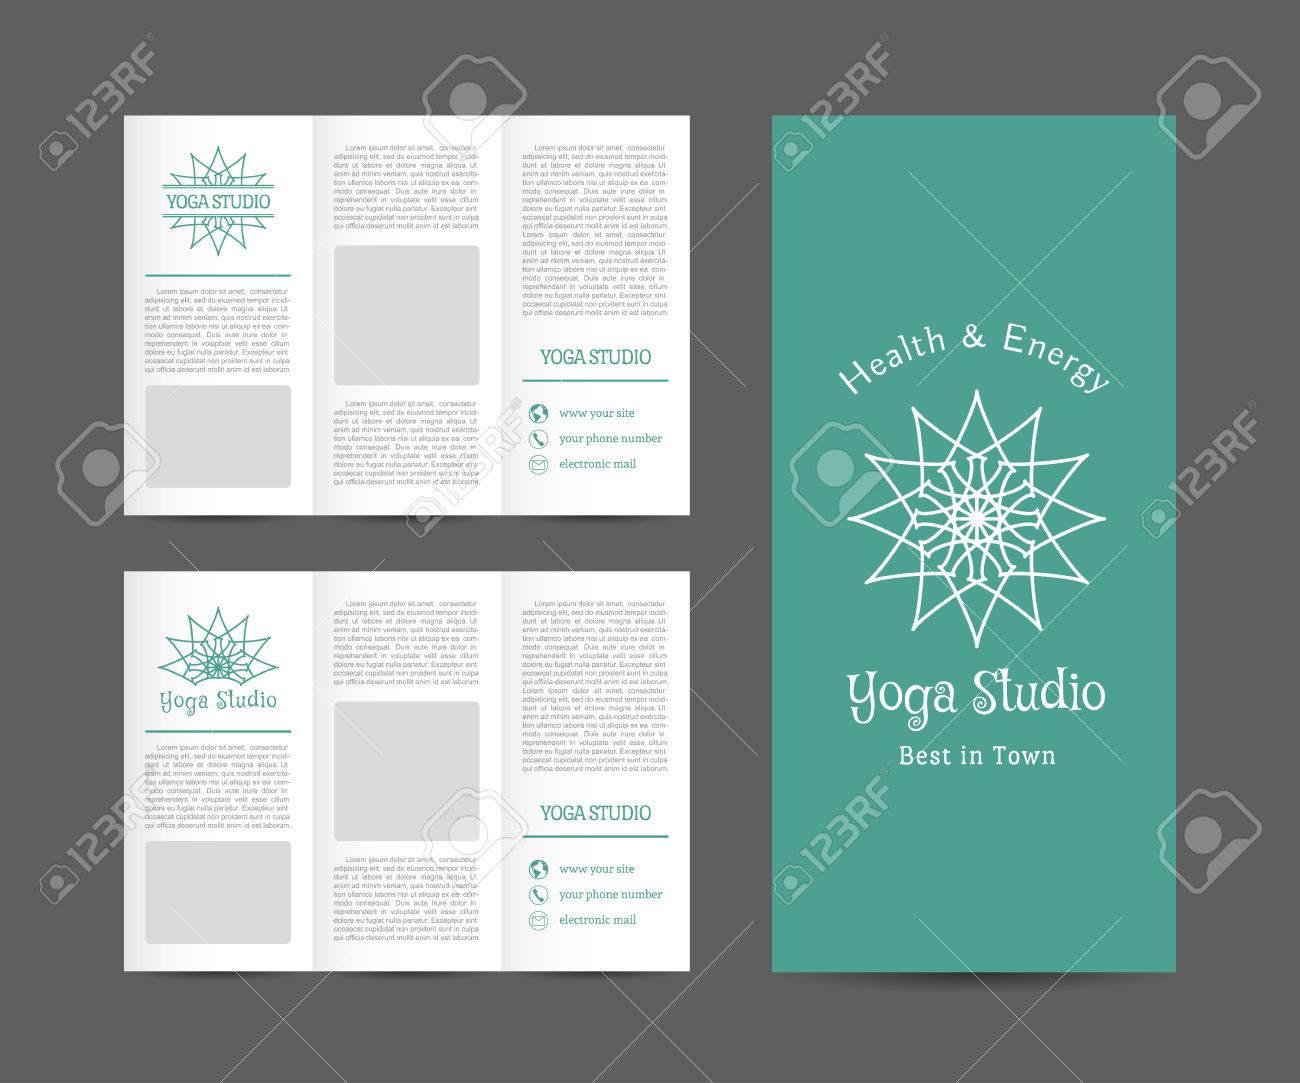 Großzügig Yoga Flyer Vorlage Fotos - Entry Level Resume Vorlagen ...